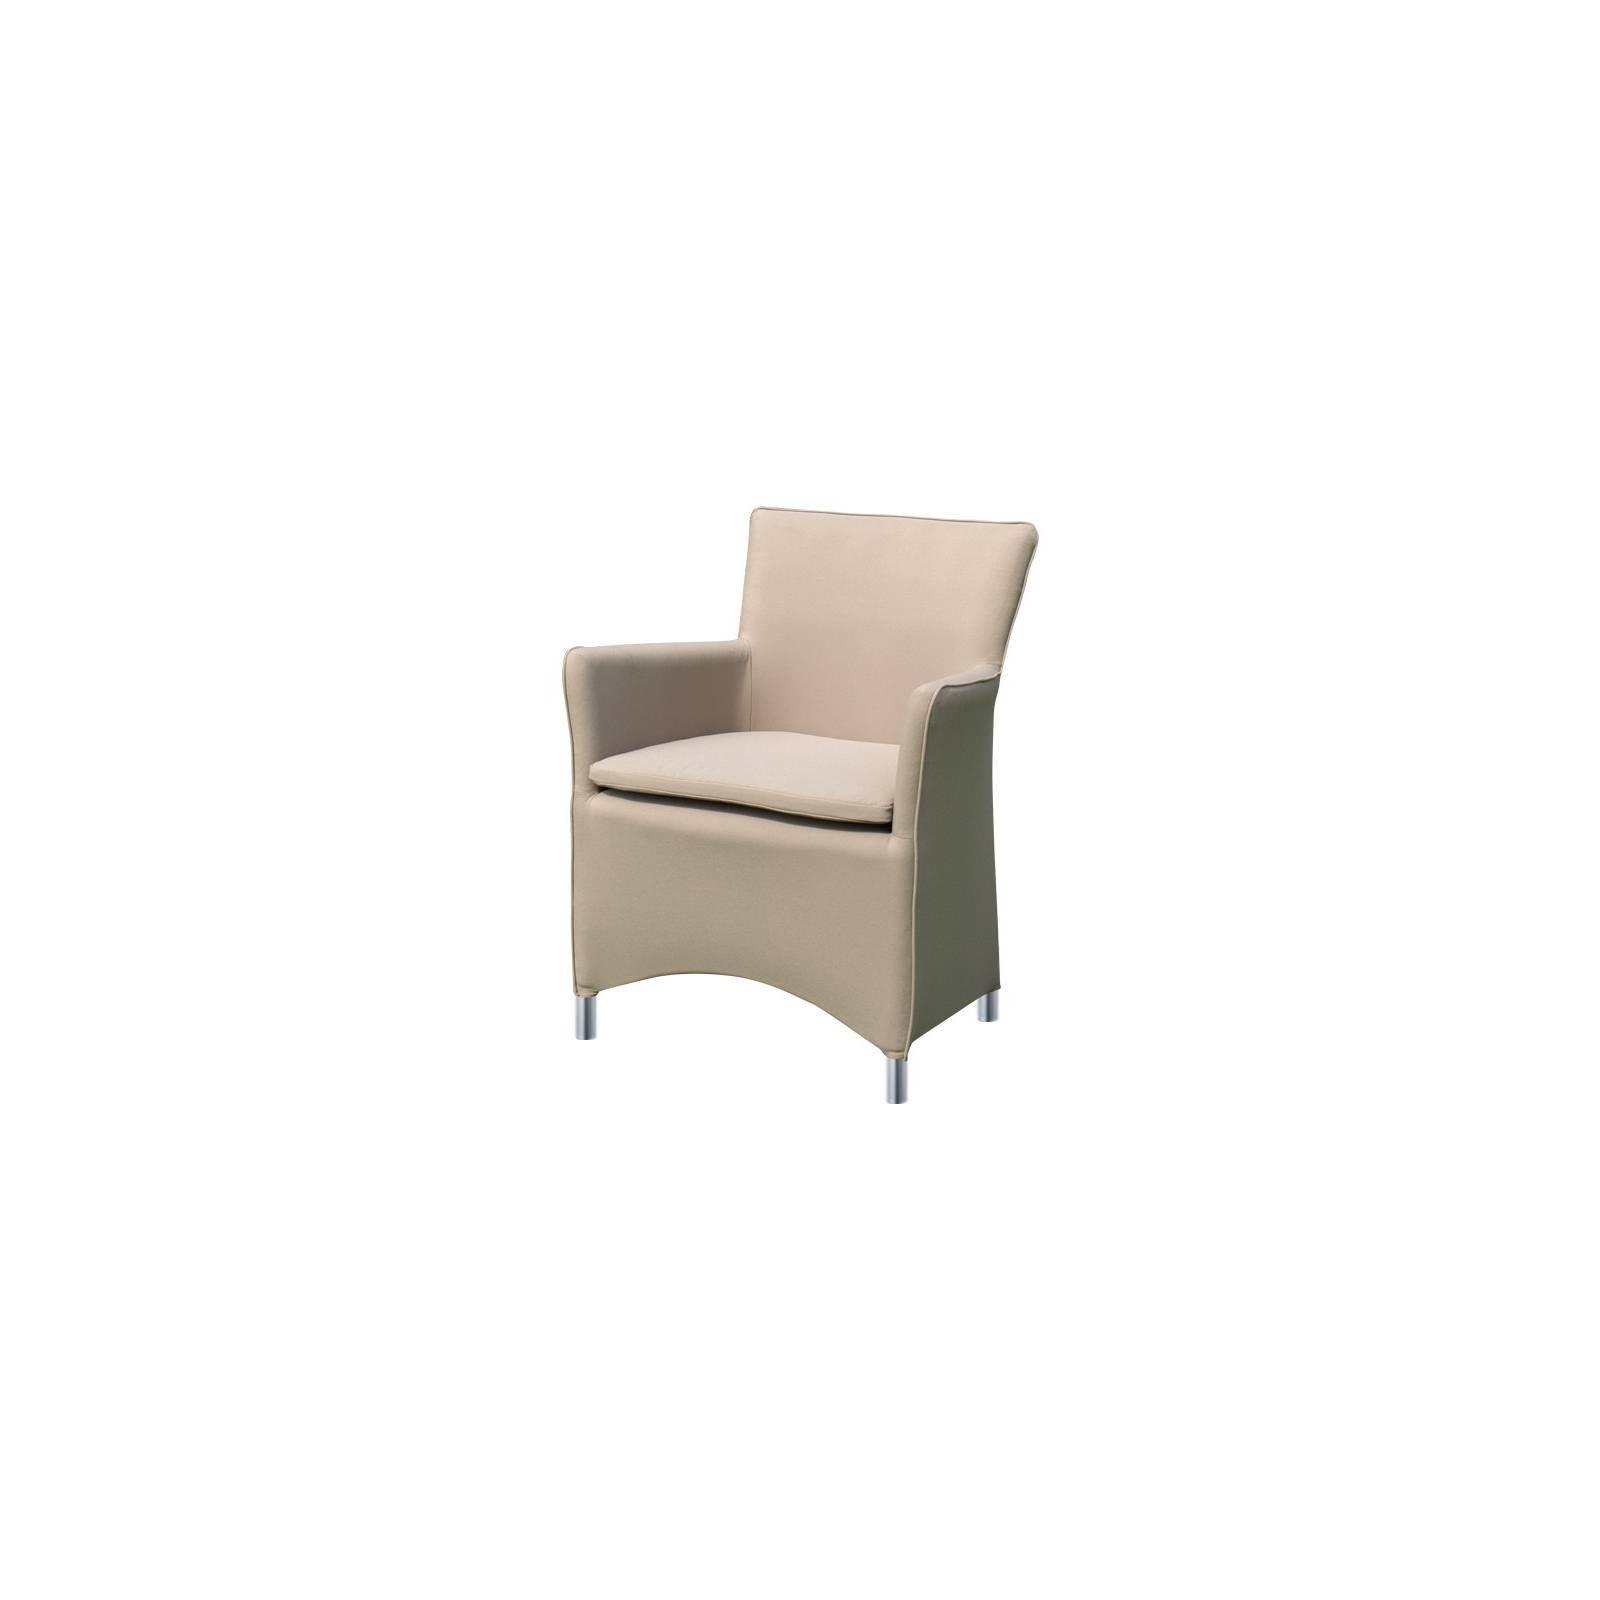 Fauteuil Zara Tissu - fauteuil design